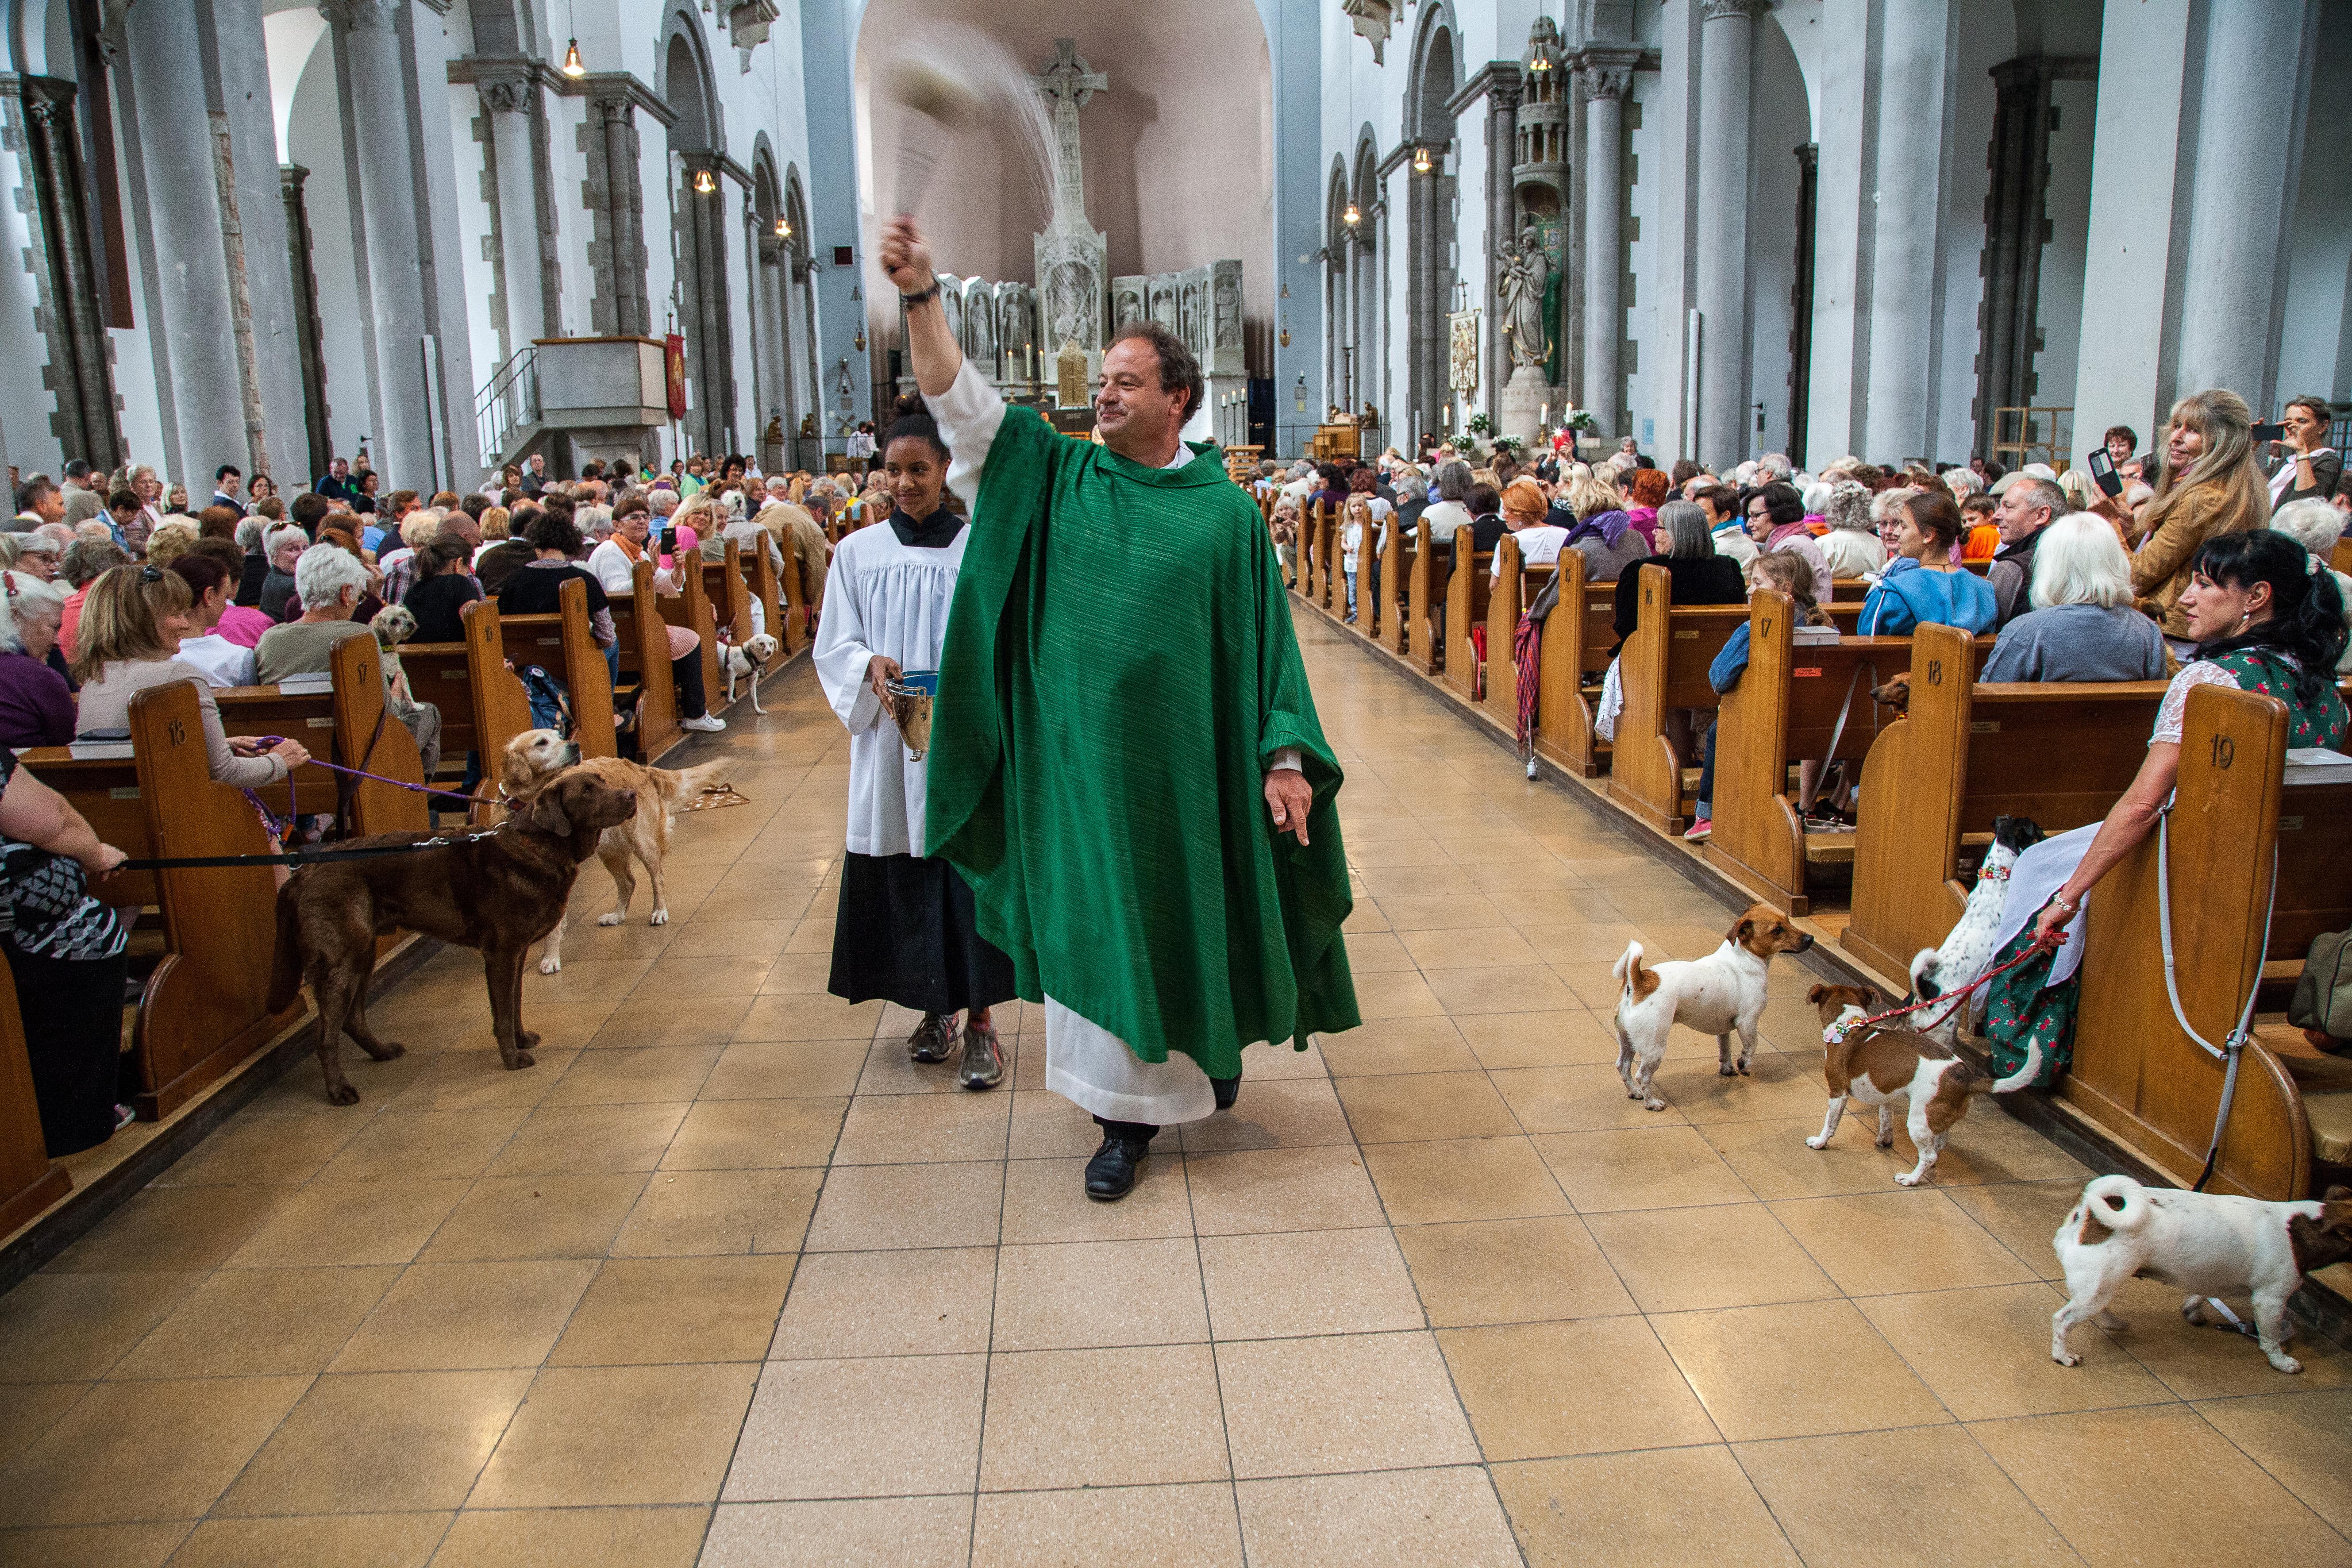 St. Maximilian München Pfarrer Schießler